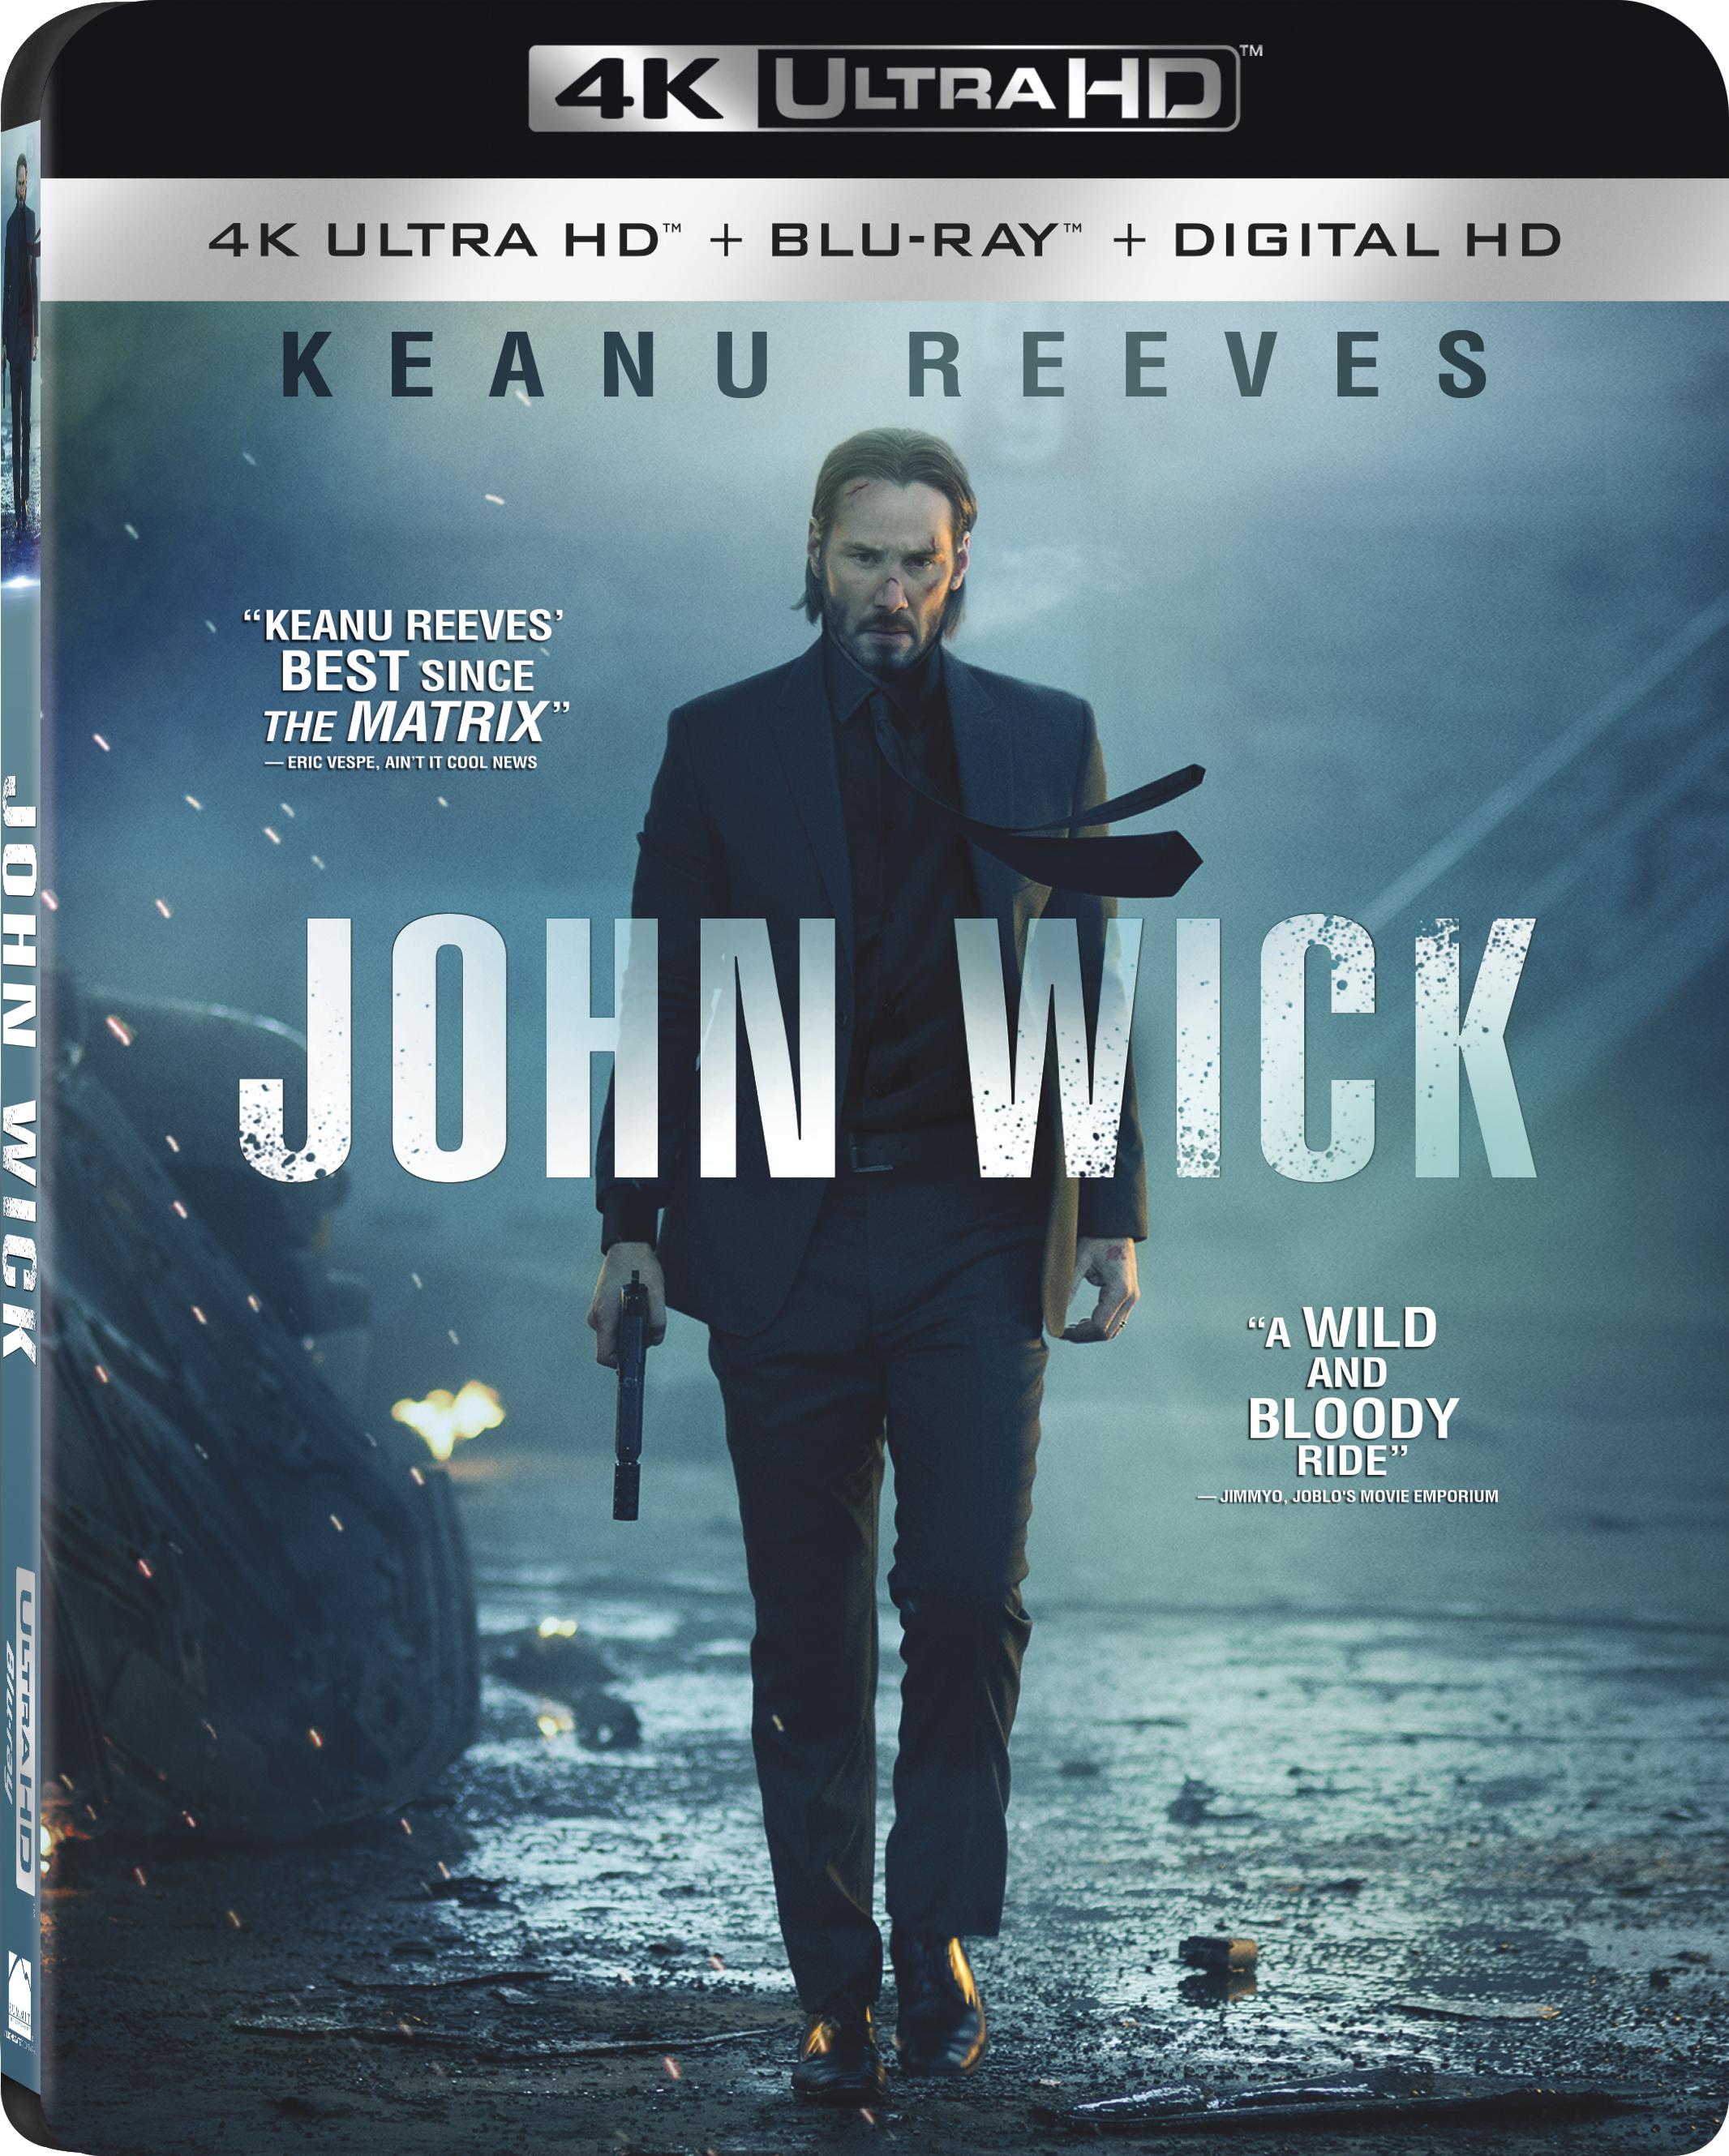 John Wick 4K (2014) Ultra HD Blu-ray